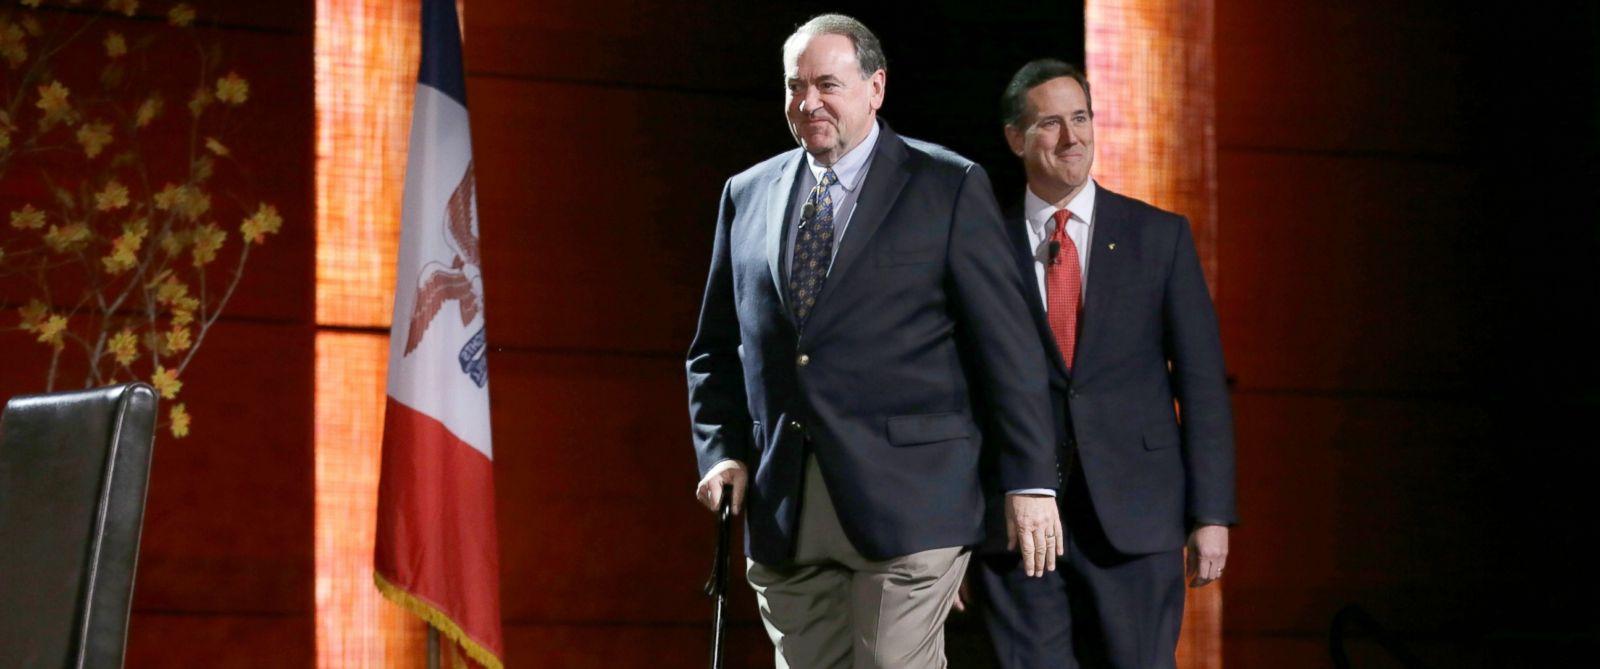 PHOTO: Republican presidential candidates former Arkansas Gov. Mike Huckabee and former Pennsylvania Sen. Rick Santorum, right, walk on the stage at the start of the Presidential Family Forum, Nov. 20, 2015, in Des Moines, Iowa.